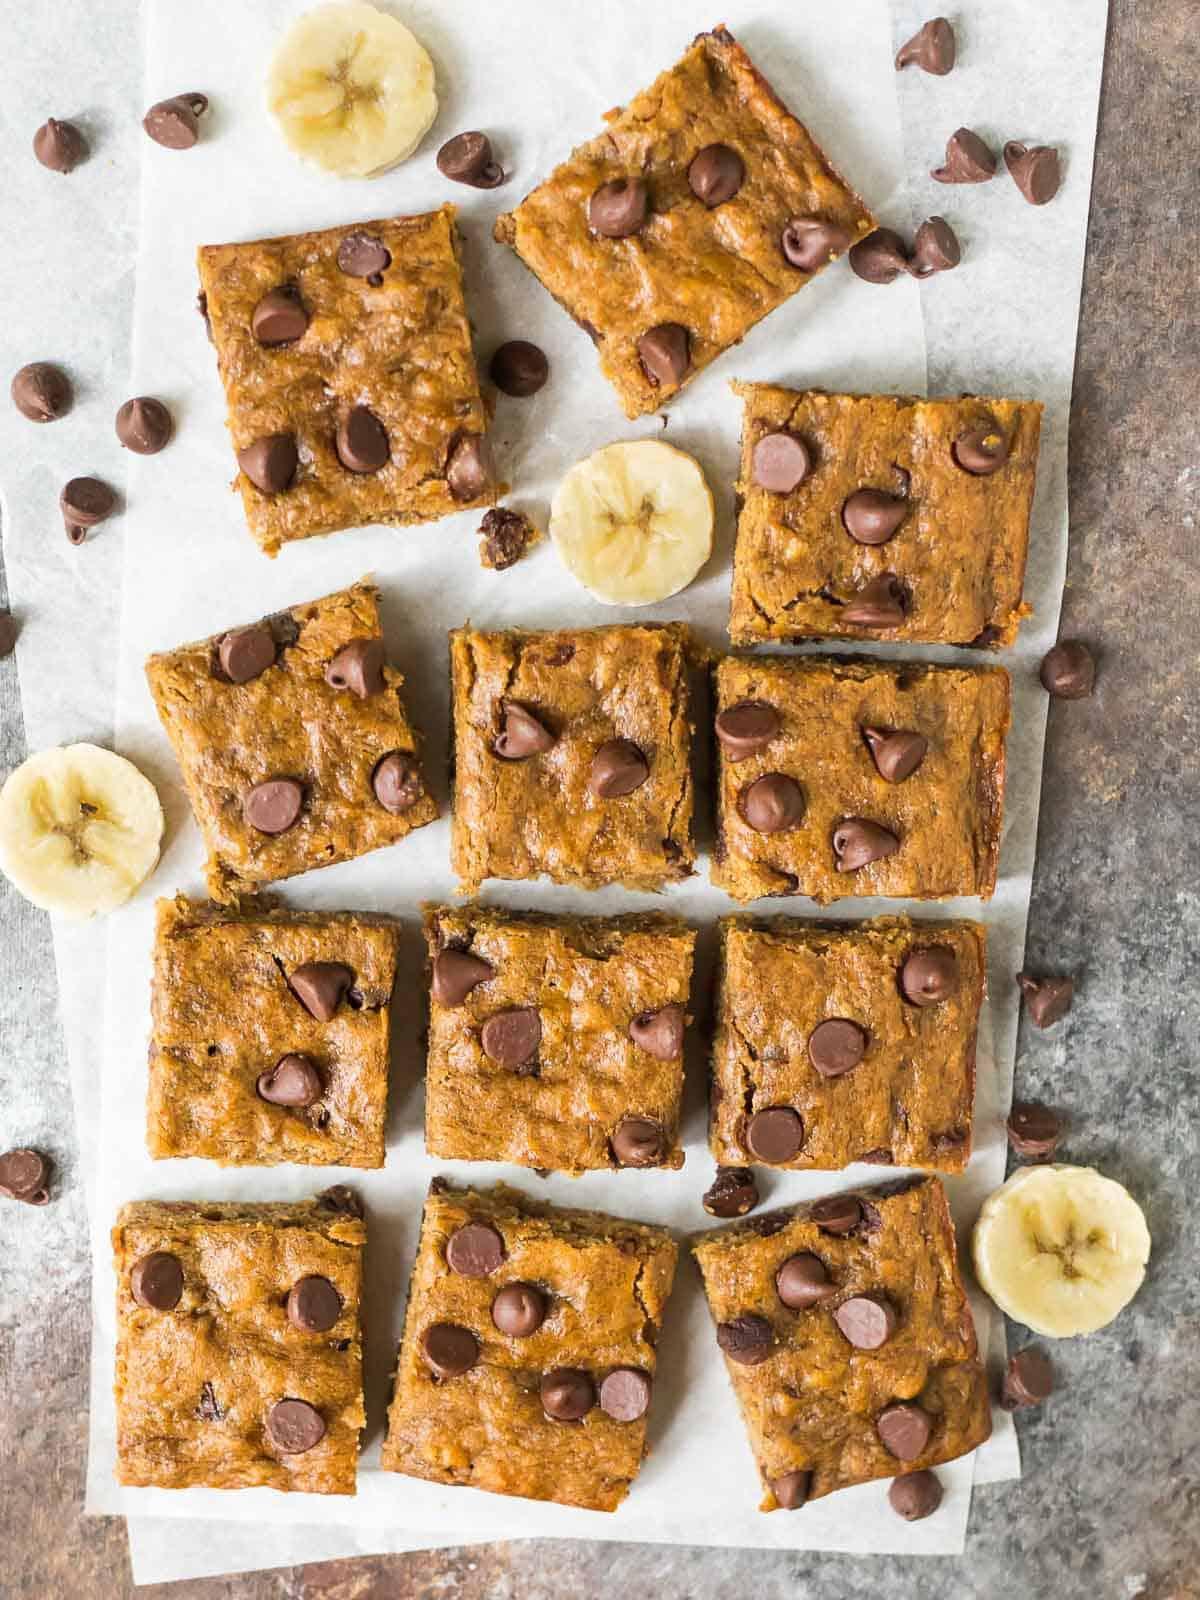 Healthy baked banana bars